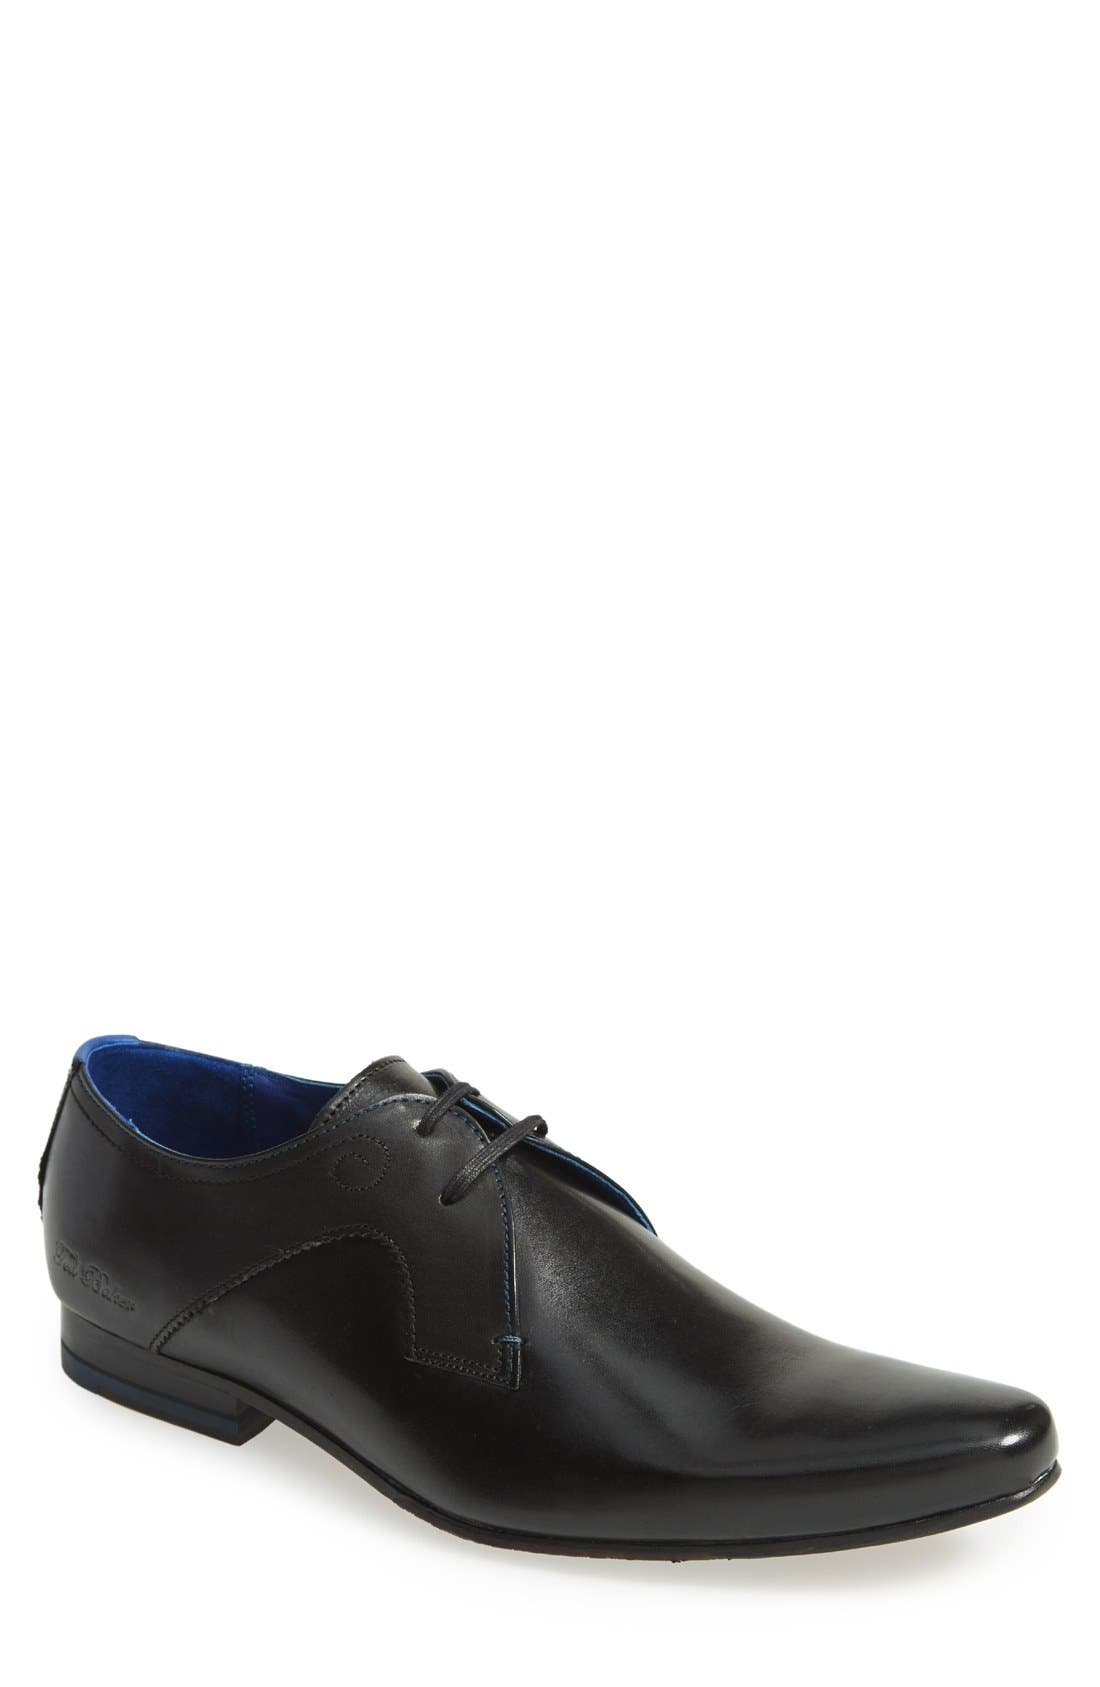 'Martt' Plain Toe Derby, Main, color, 001